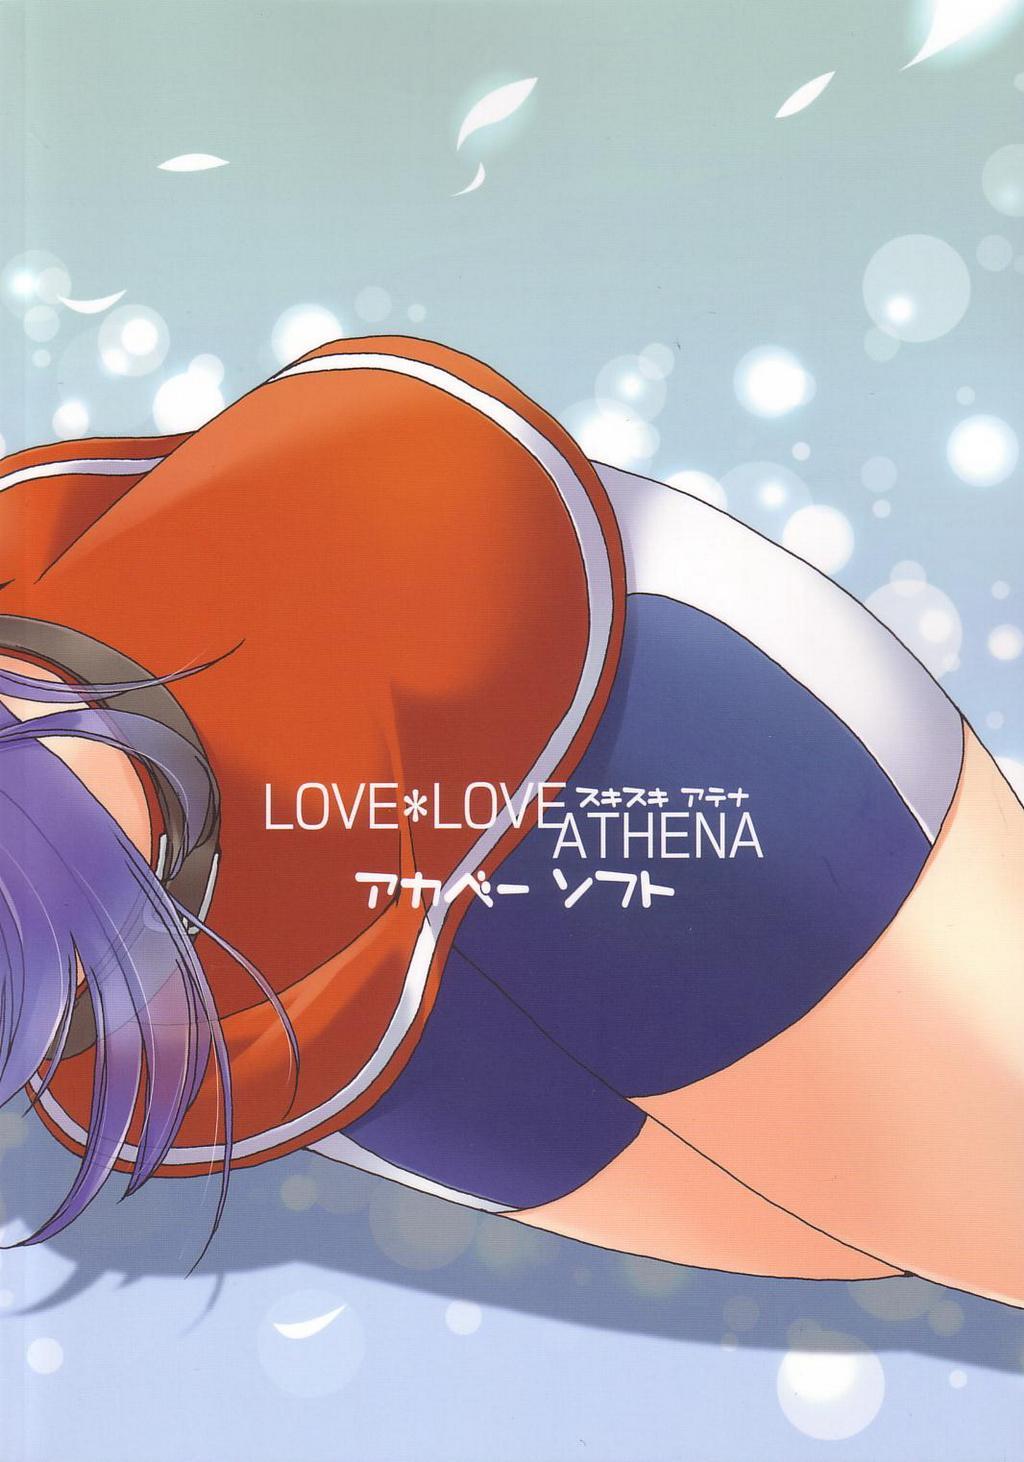 LOVE*LOVE ATHENA 25